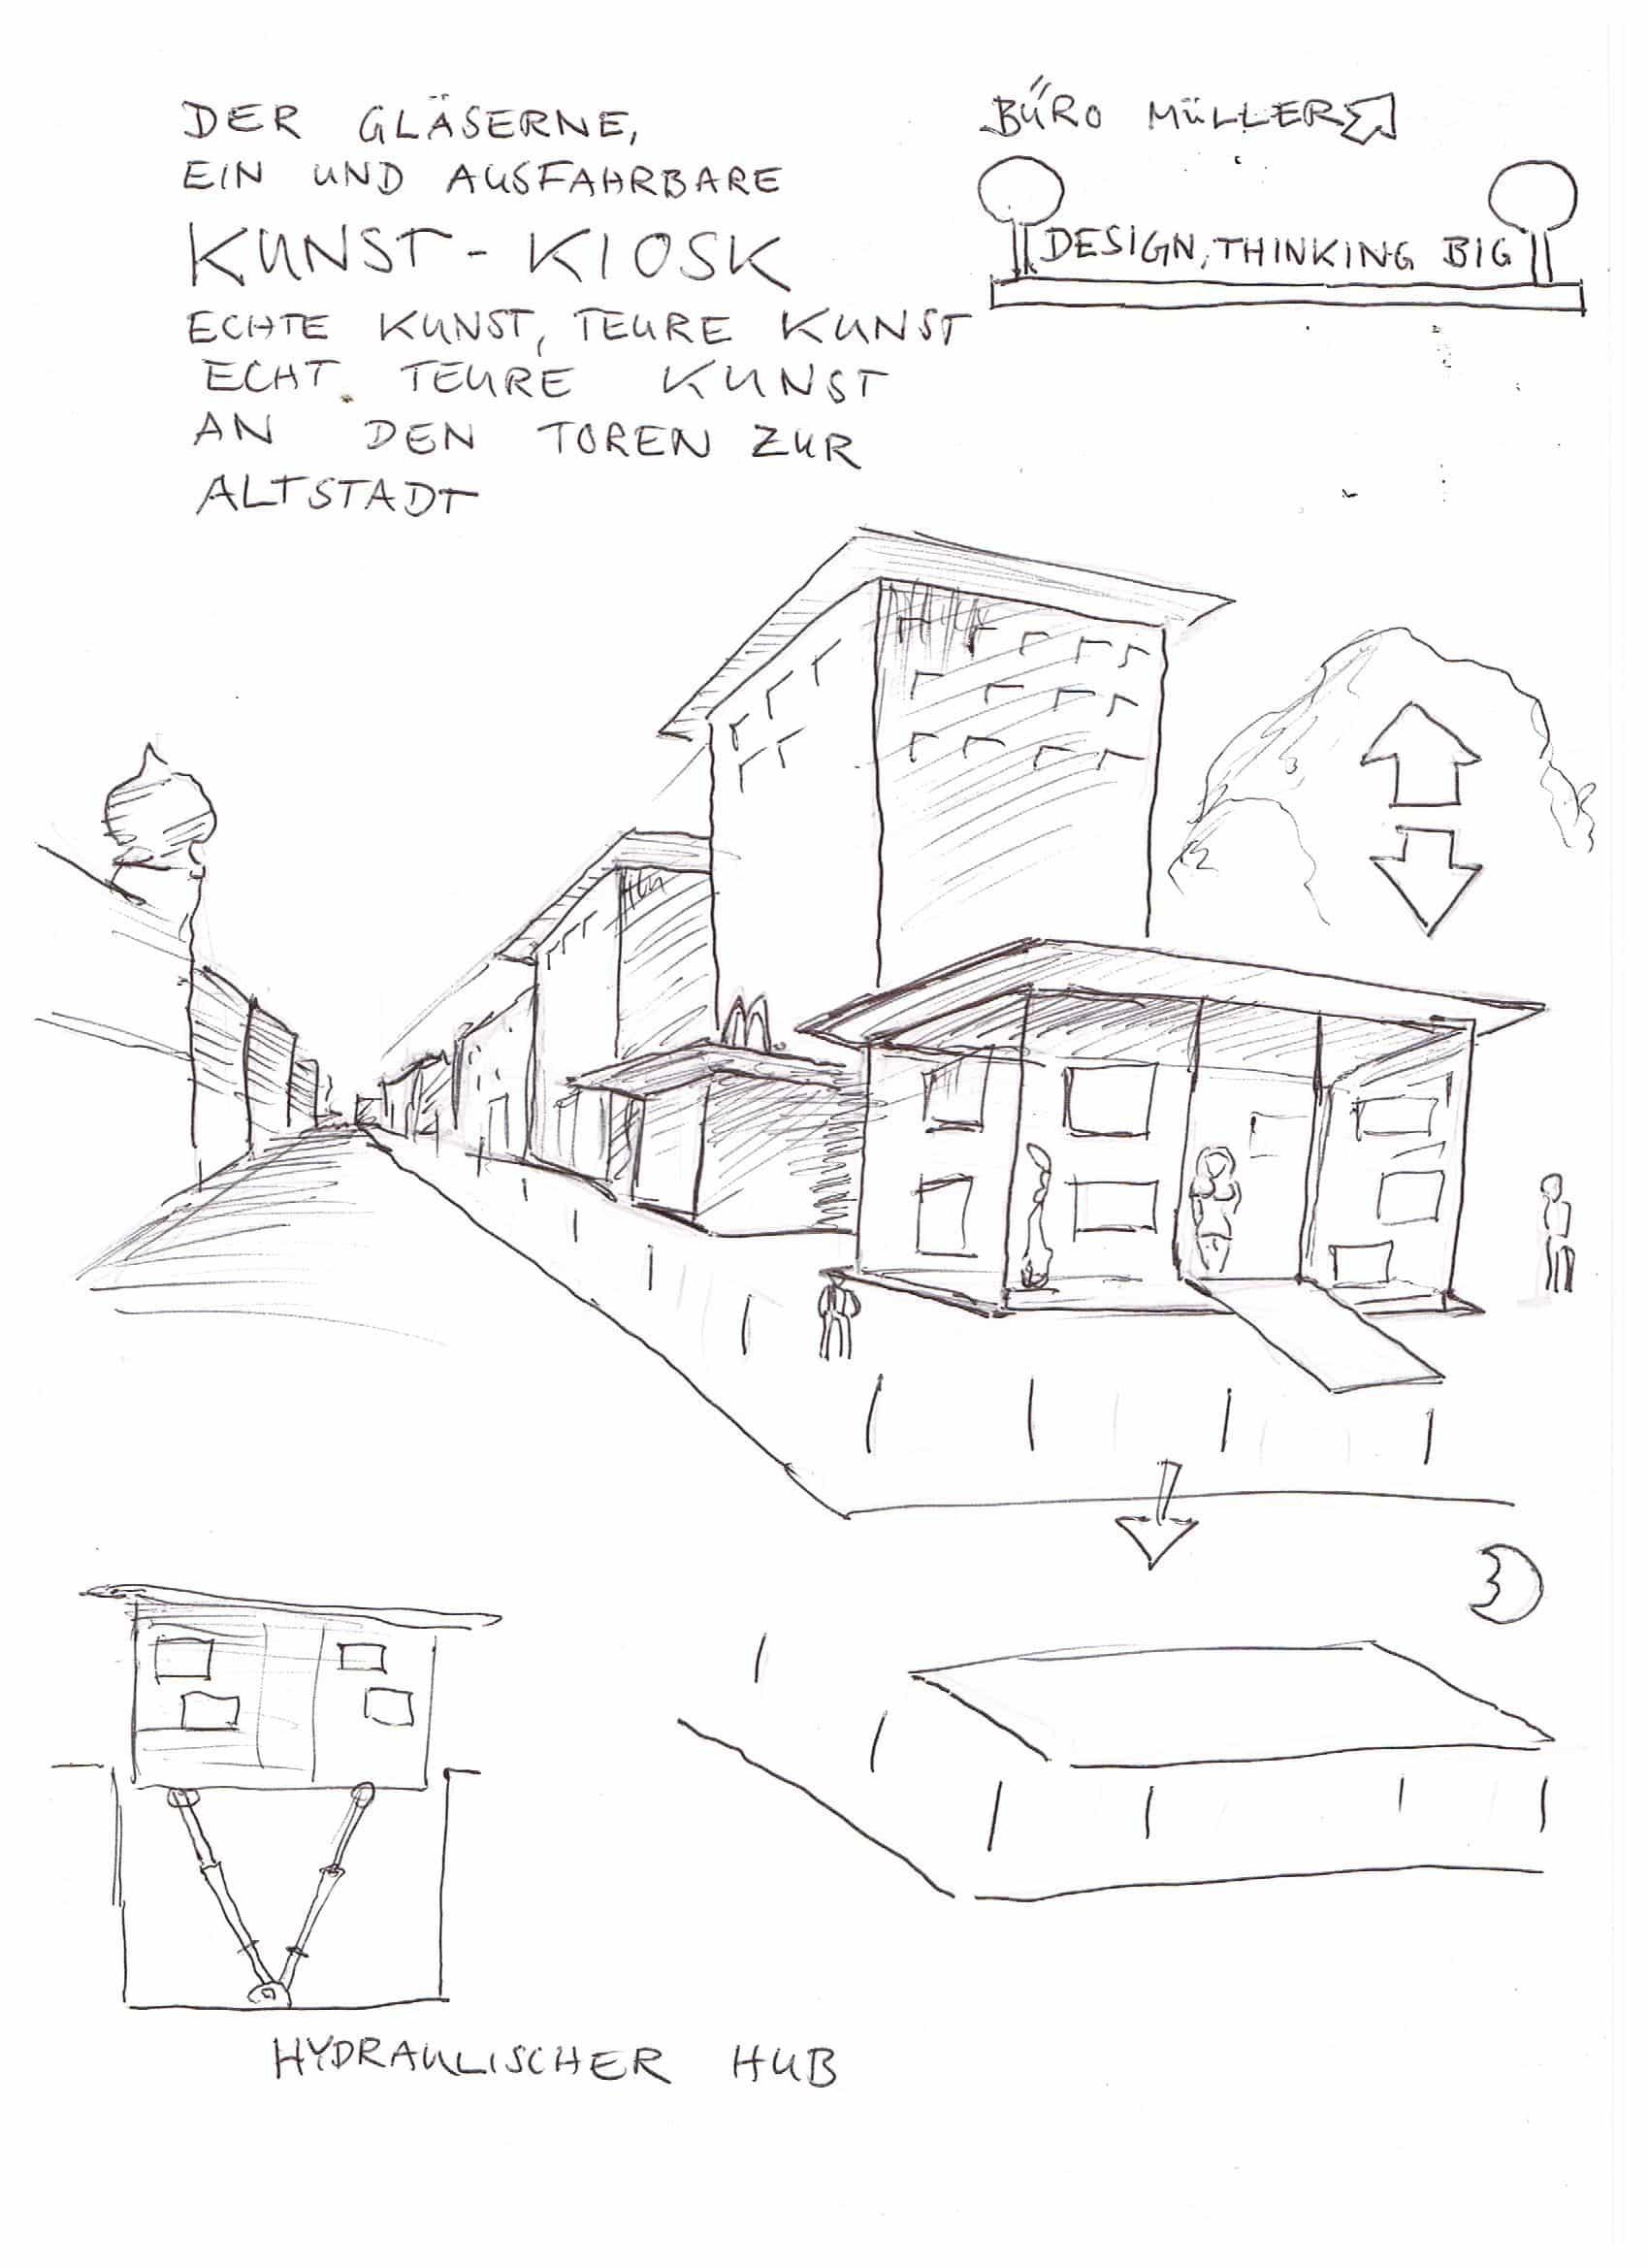 """Der gläserne, versenkbare Kunst-Kiosk. Echte Kunst, teure Kunst, echt teure Kunst an den Toren zur Altstadt."" Bild: ""BÜRO MÜLLER, DESIGN THINKIN BIG"""